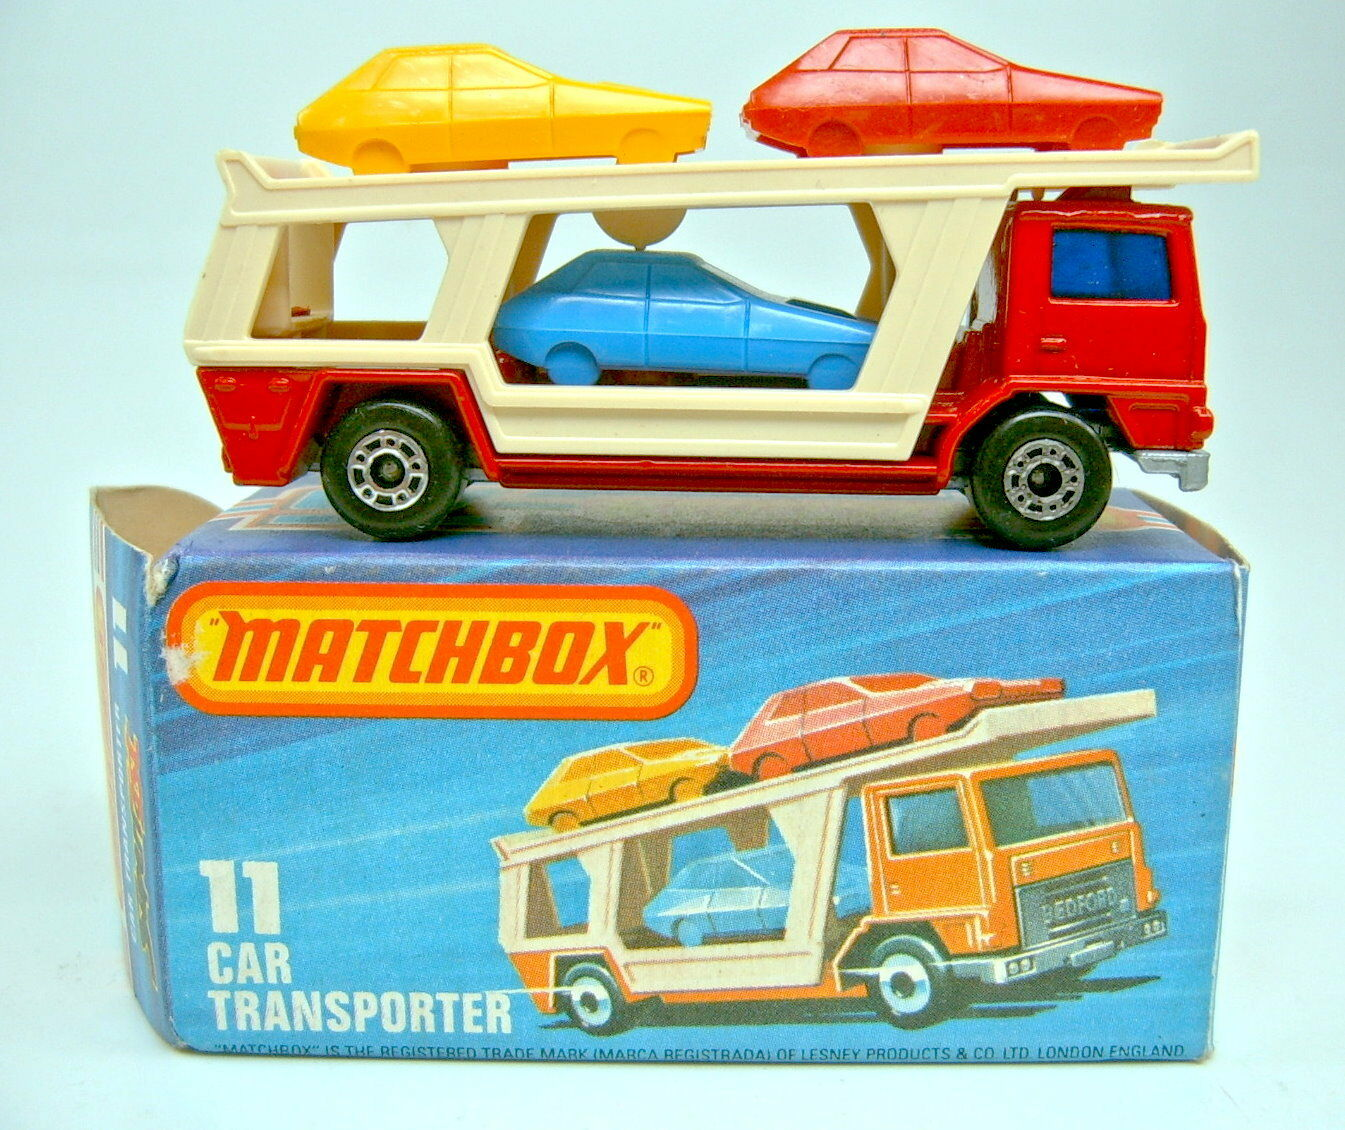 ventas en linea Matchbox súperfast nº 11c Coche Transporter rojo plata la la la placa base raras  directo de fábrica